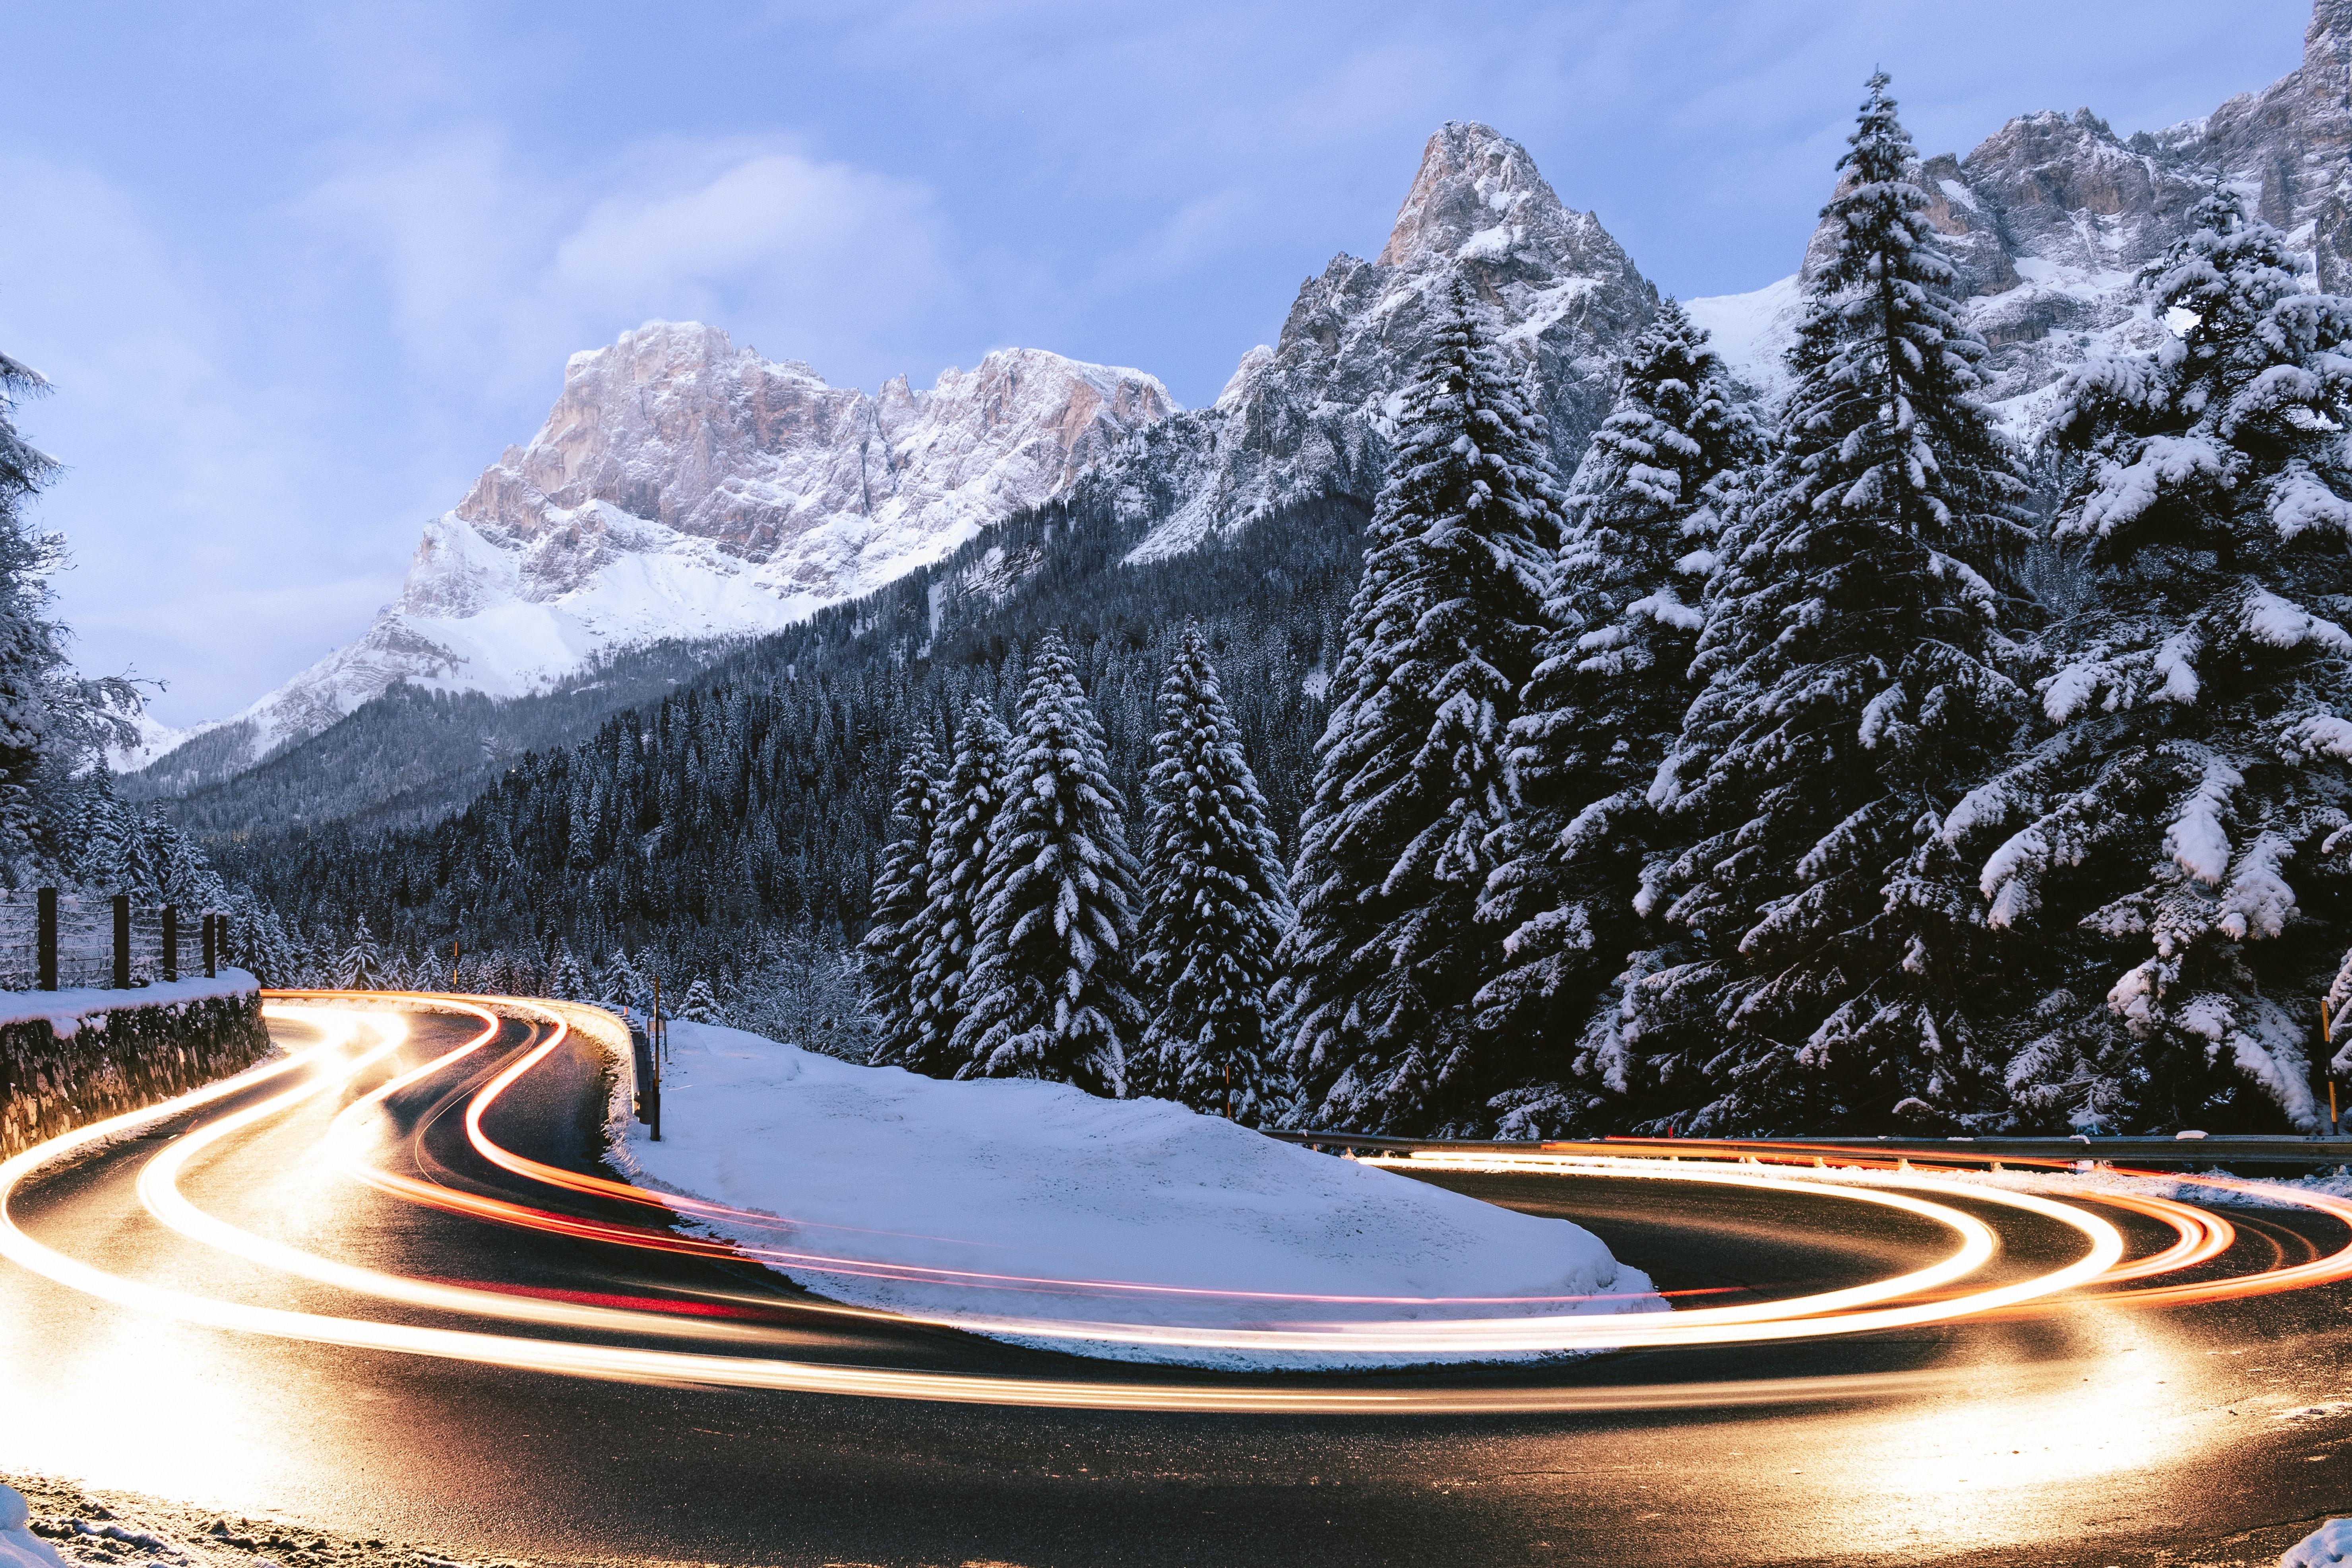 full hd wallpaper download,mountainous landforms,mountain,natural landscape,nature,snow